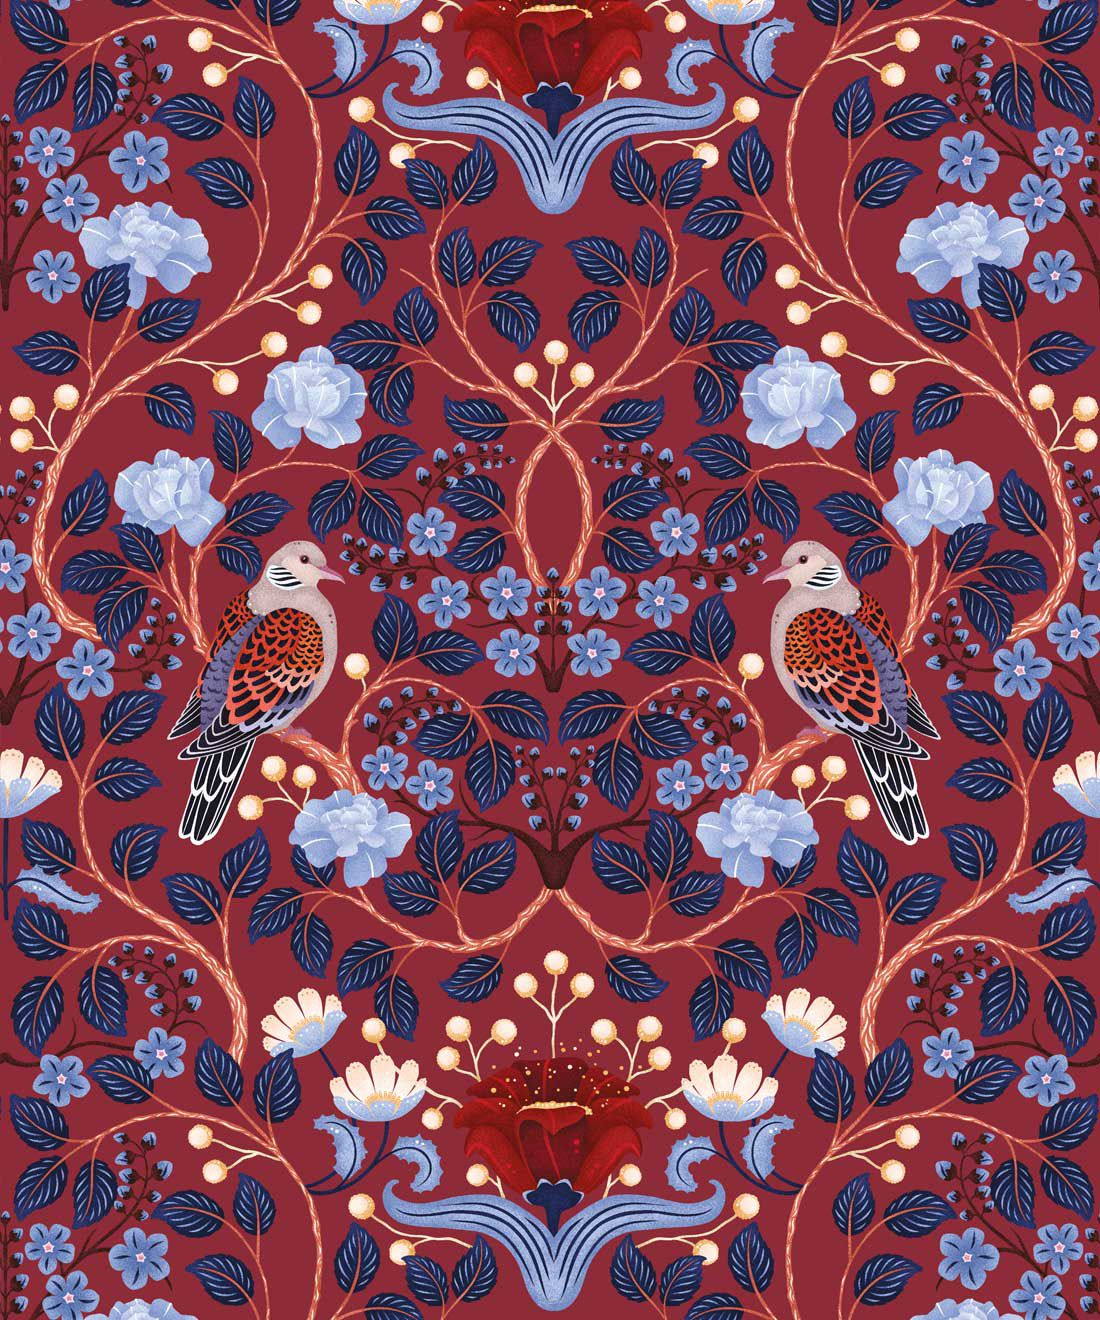 Turtle Doves Wallpaper • Bold Colorful Bird Wallpaper • Merlot •Swatch